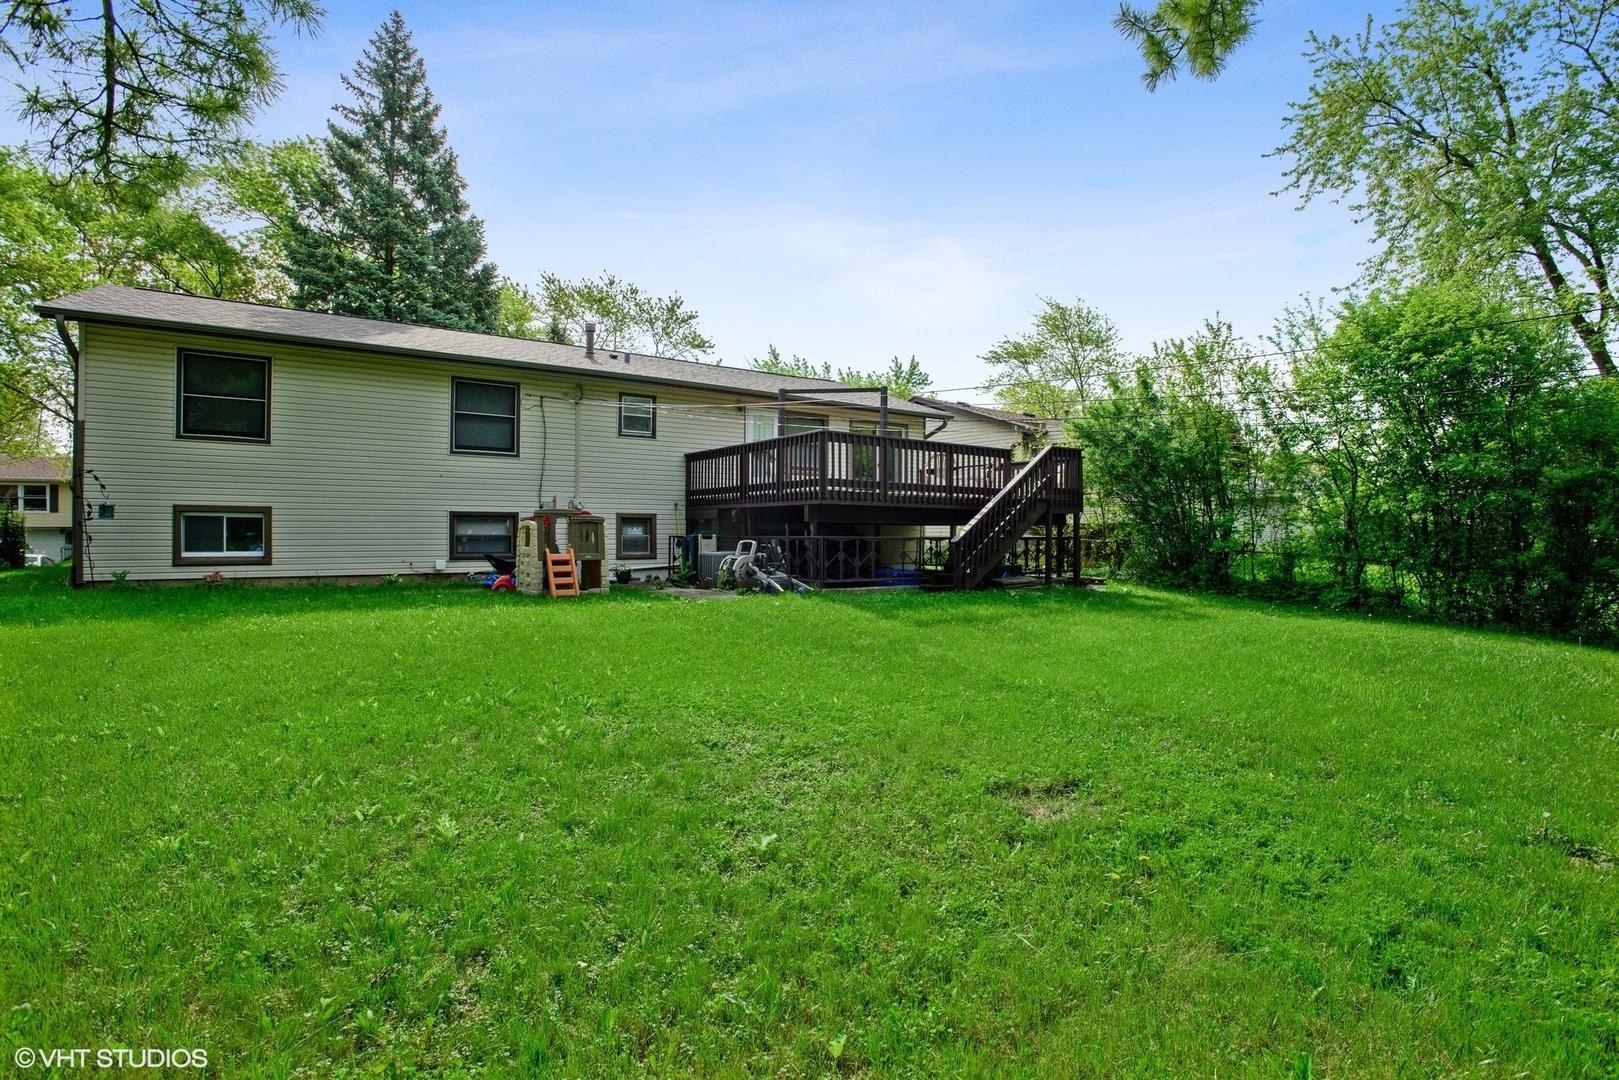 7078 Glenwood, Hanover Park, Illinois, 60133